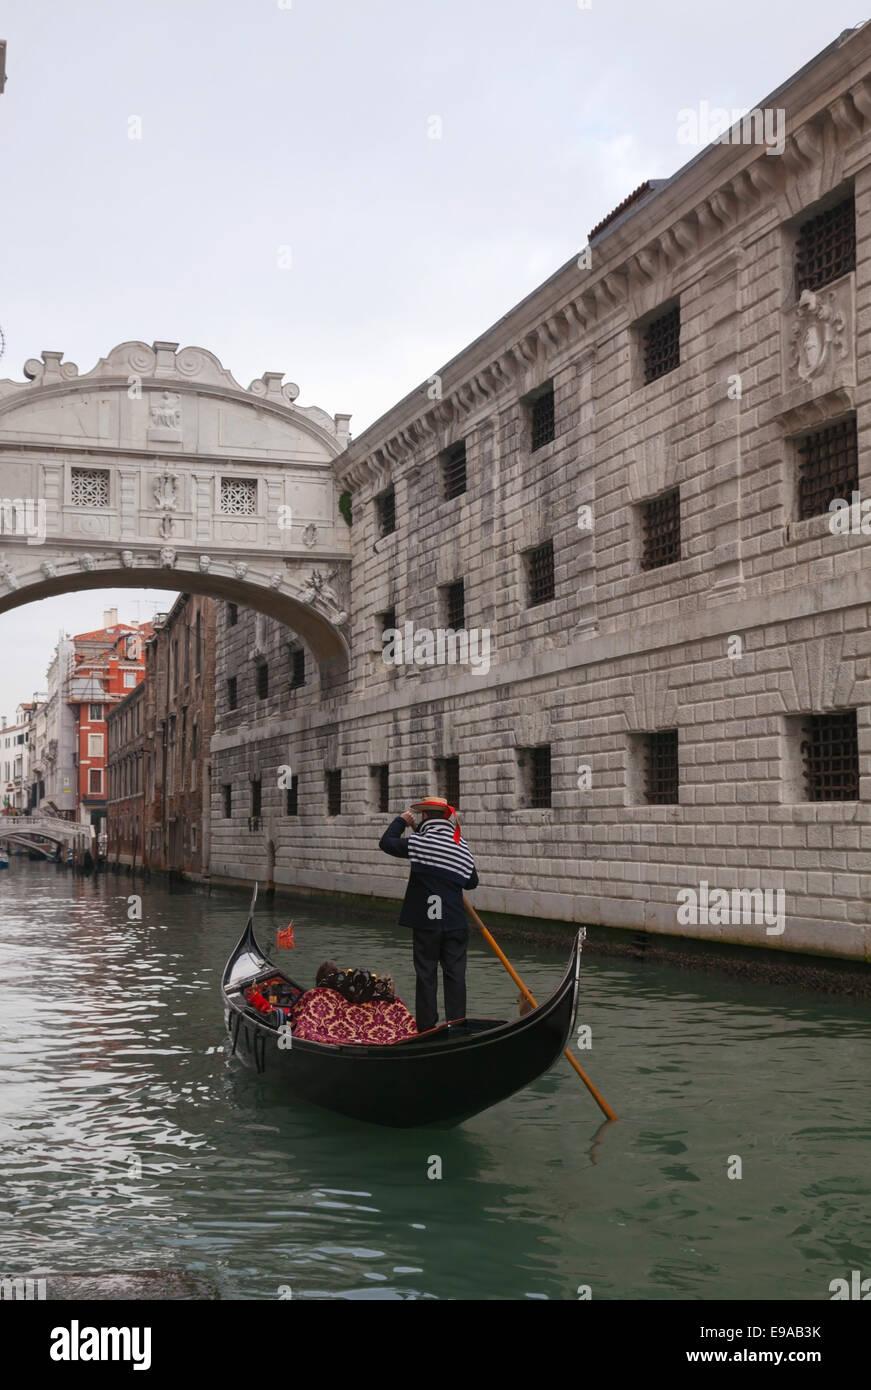 Gondolier under the Bridge of Sighs - Stock Image